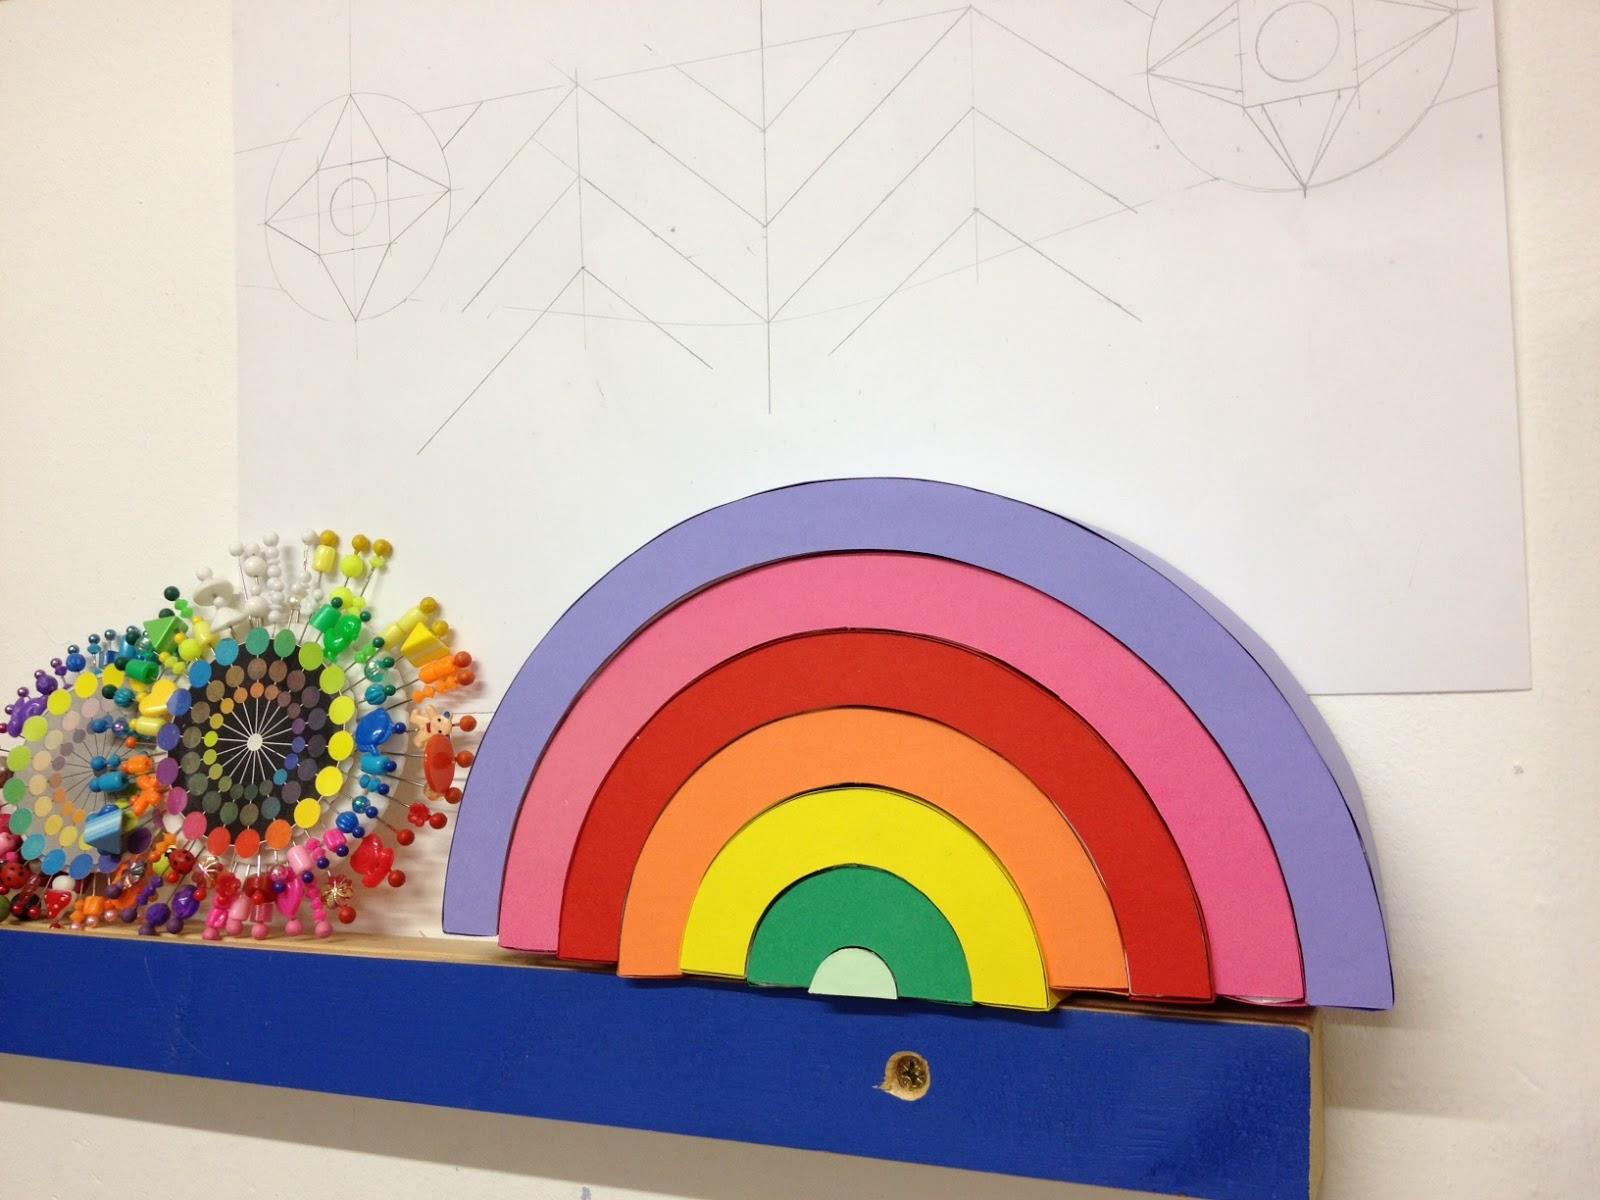 http://4.bp.blogspot.com/-puwobA1fFLc/UJltwpNwLeI/AAAAAAAAhFU/bVr16mwm9TU/s1600/Full+rainbow.jpg